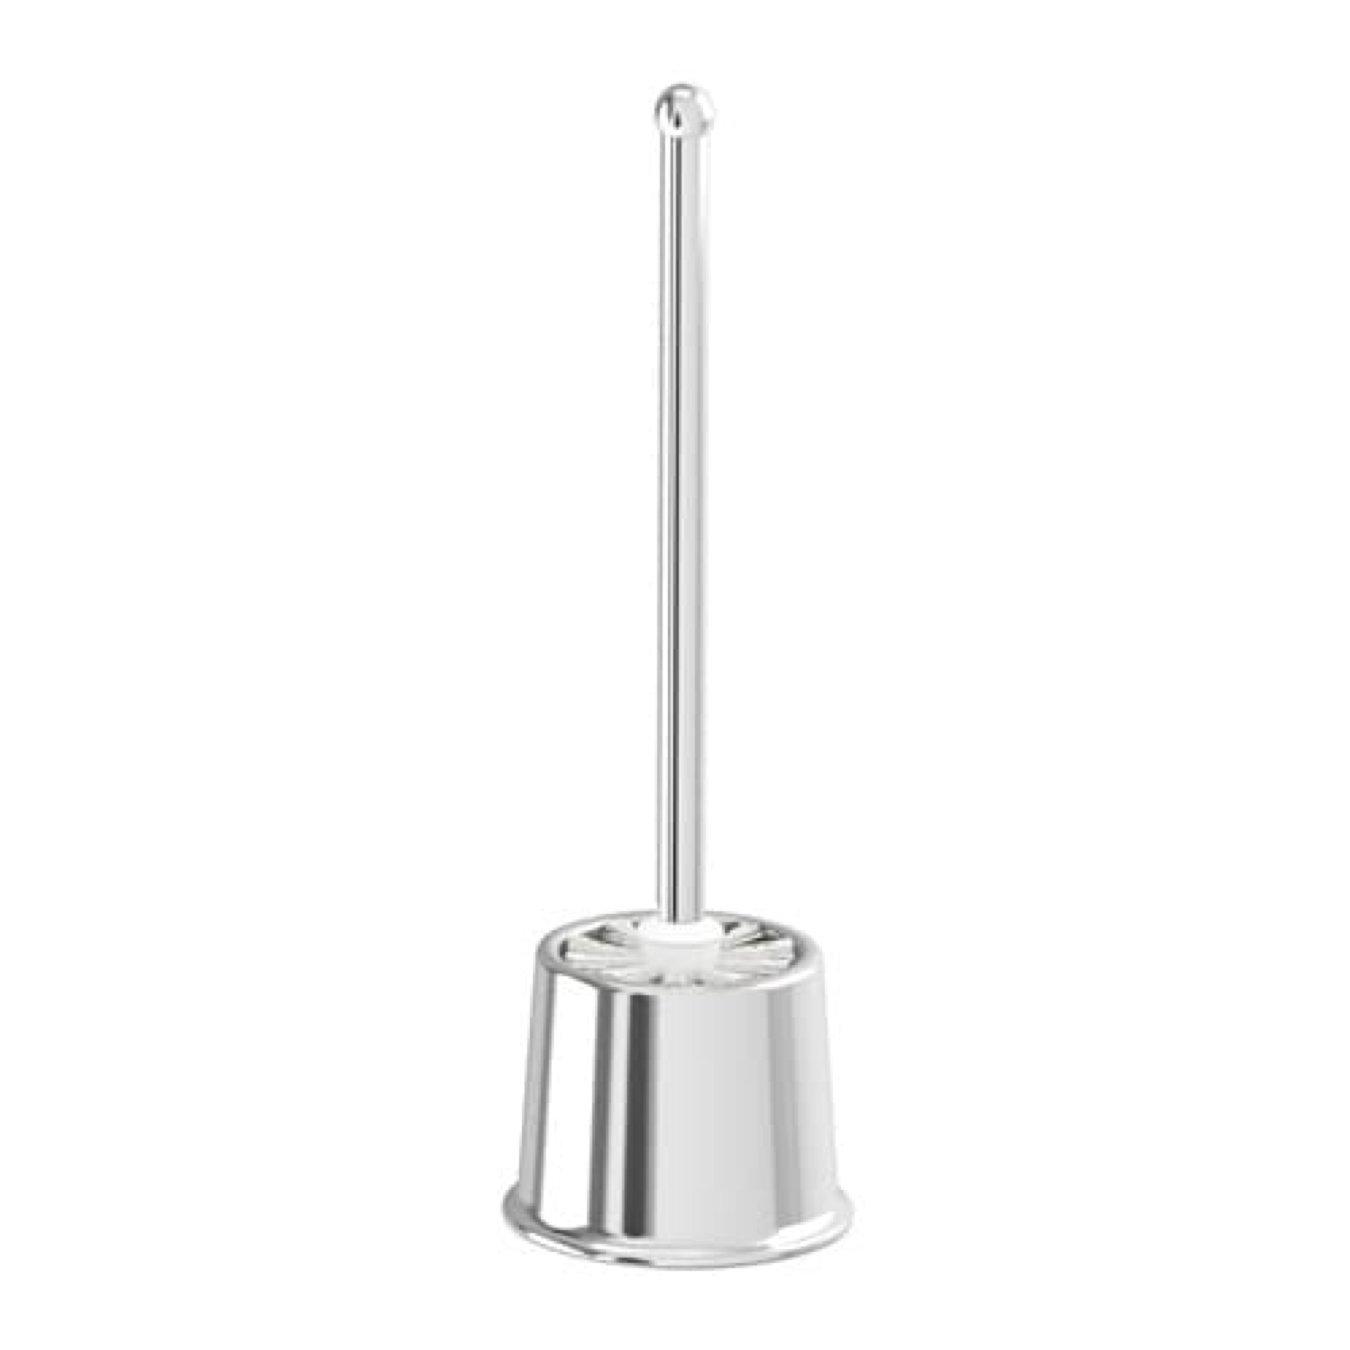 Ikea Voxnan 903.285.93 Escobilla de baño (efecto cromado